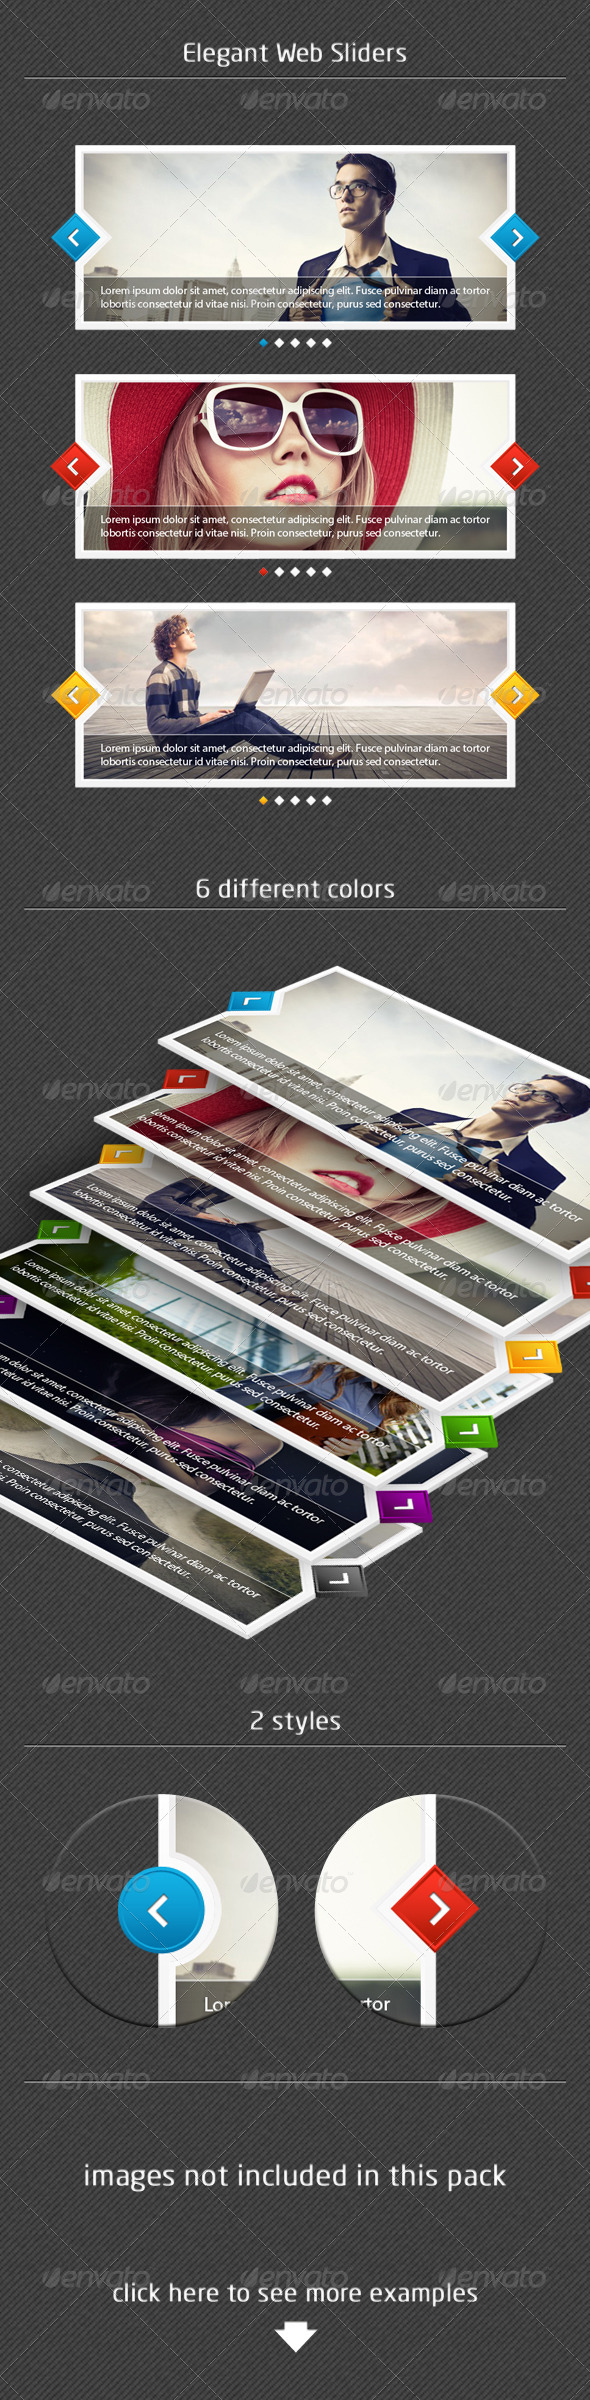 Elegant Web Sliders - Sliders & Features Web Elements